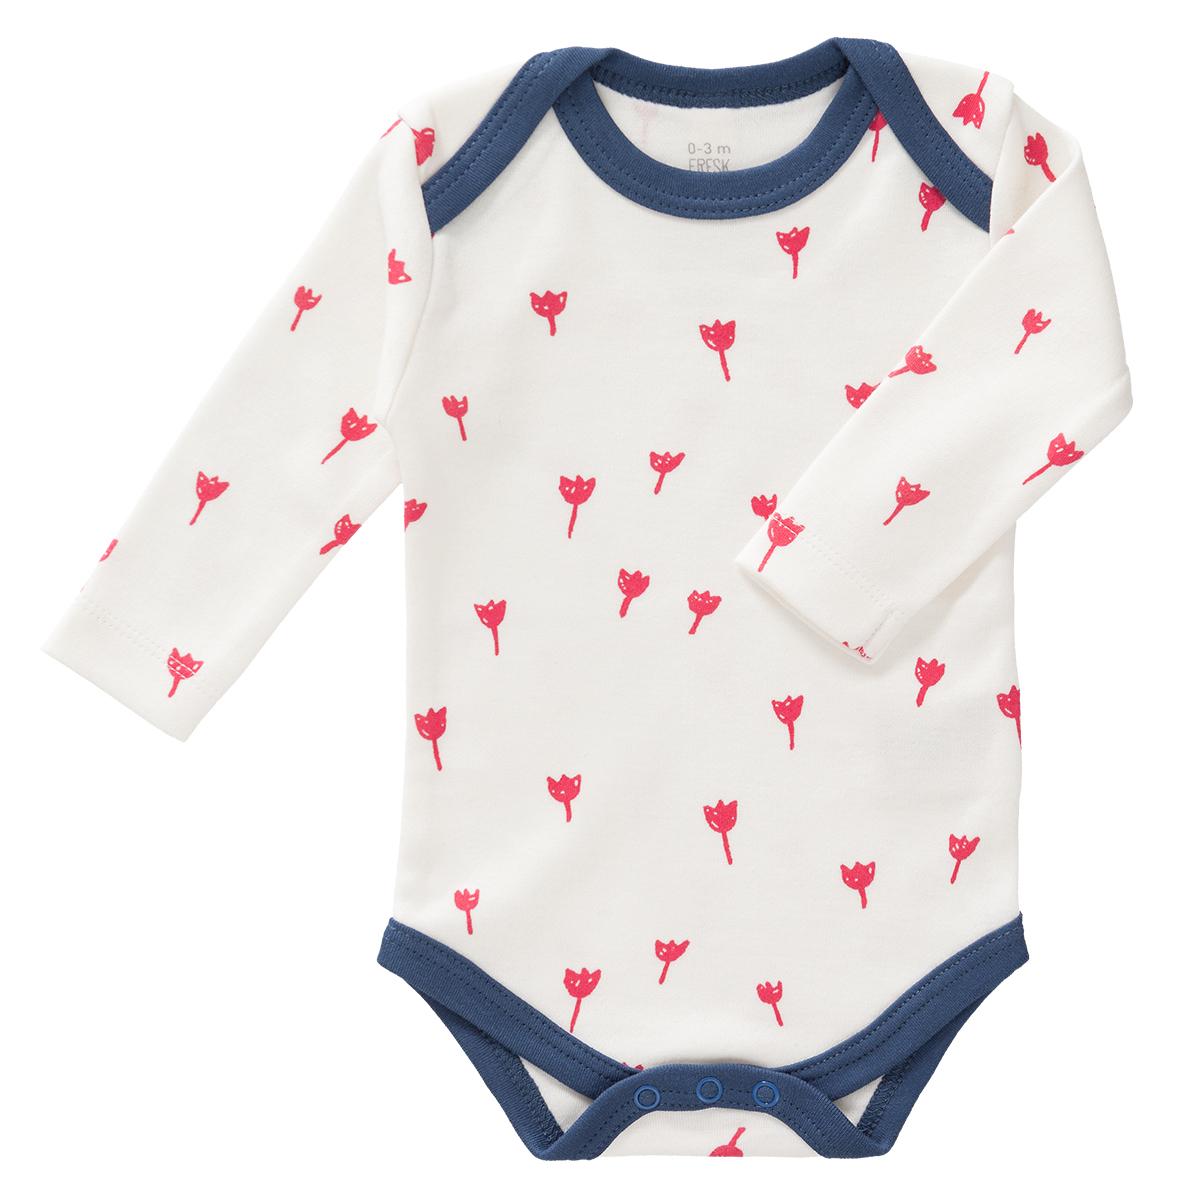 Body & Pyjama Body Manches Longues Tulipes Rouges - 0/3 Mois